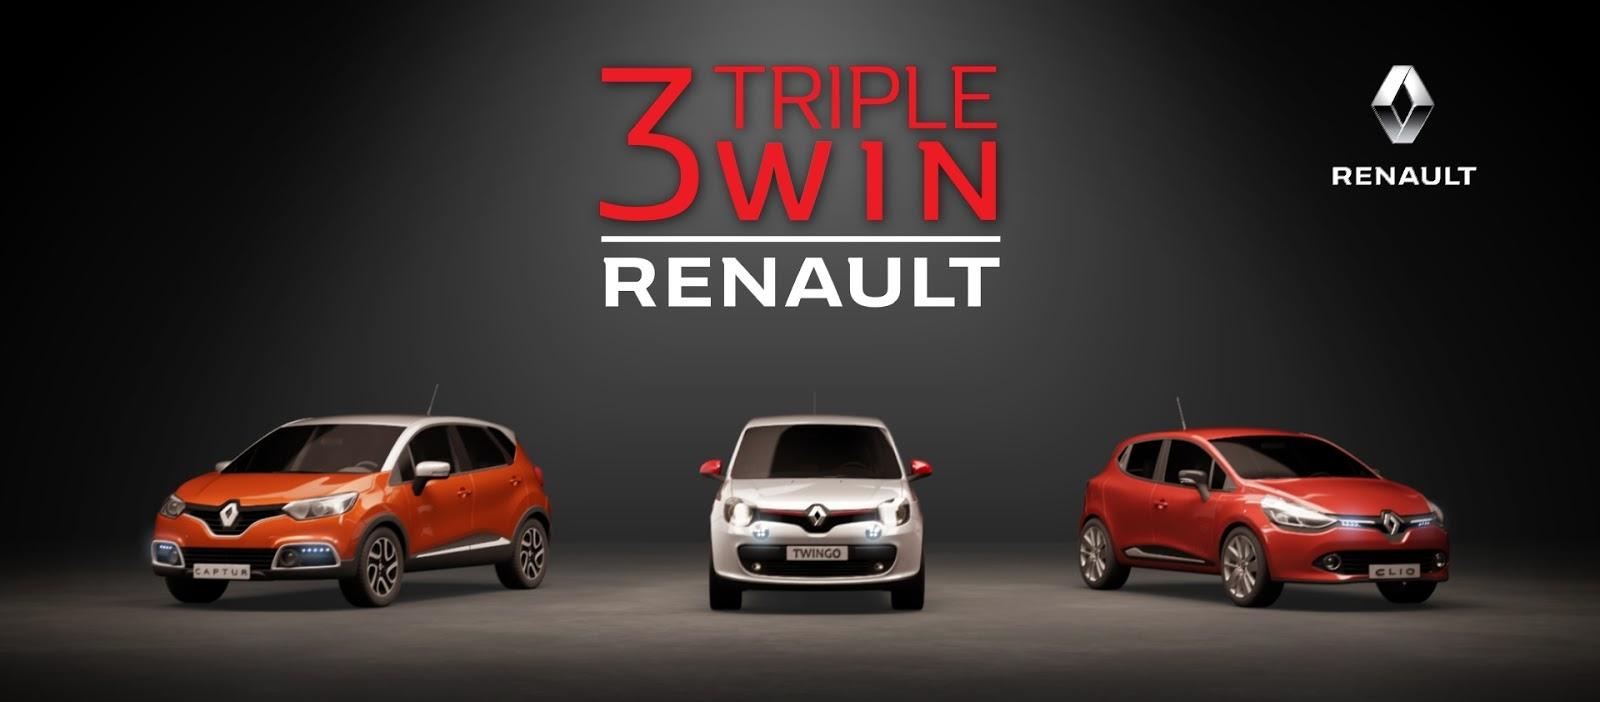 RENAULT 3Cars 23sec frame.0004 Η Renault κατακτά την πρώτη θέση στις πωλήσεις αυτοκινήτων πόλης